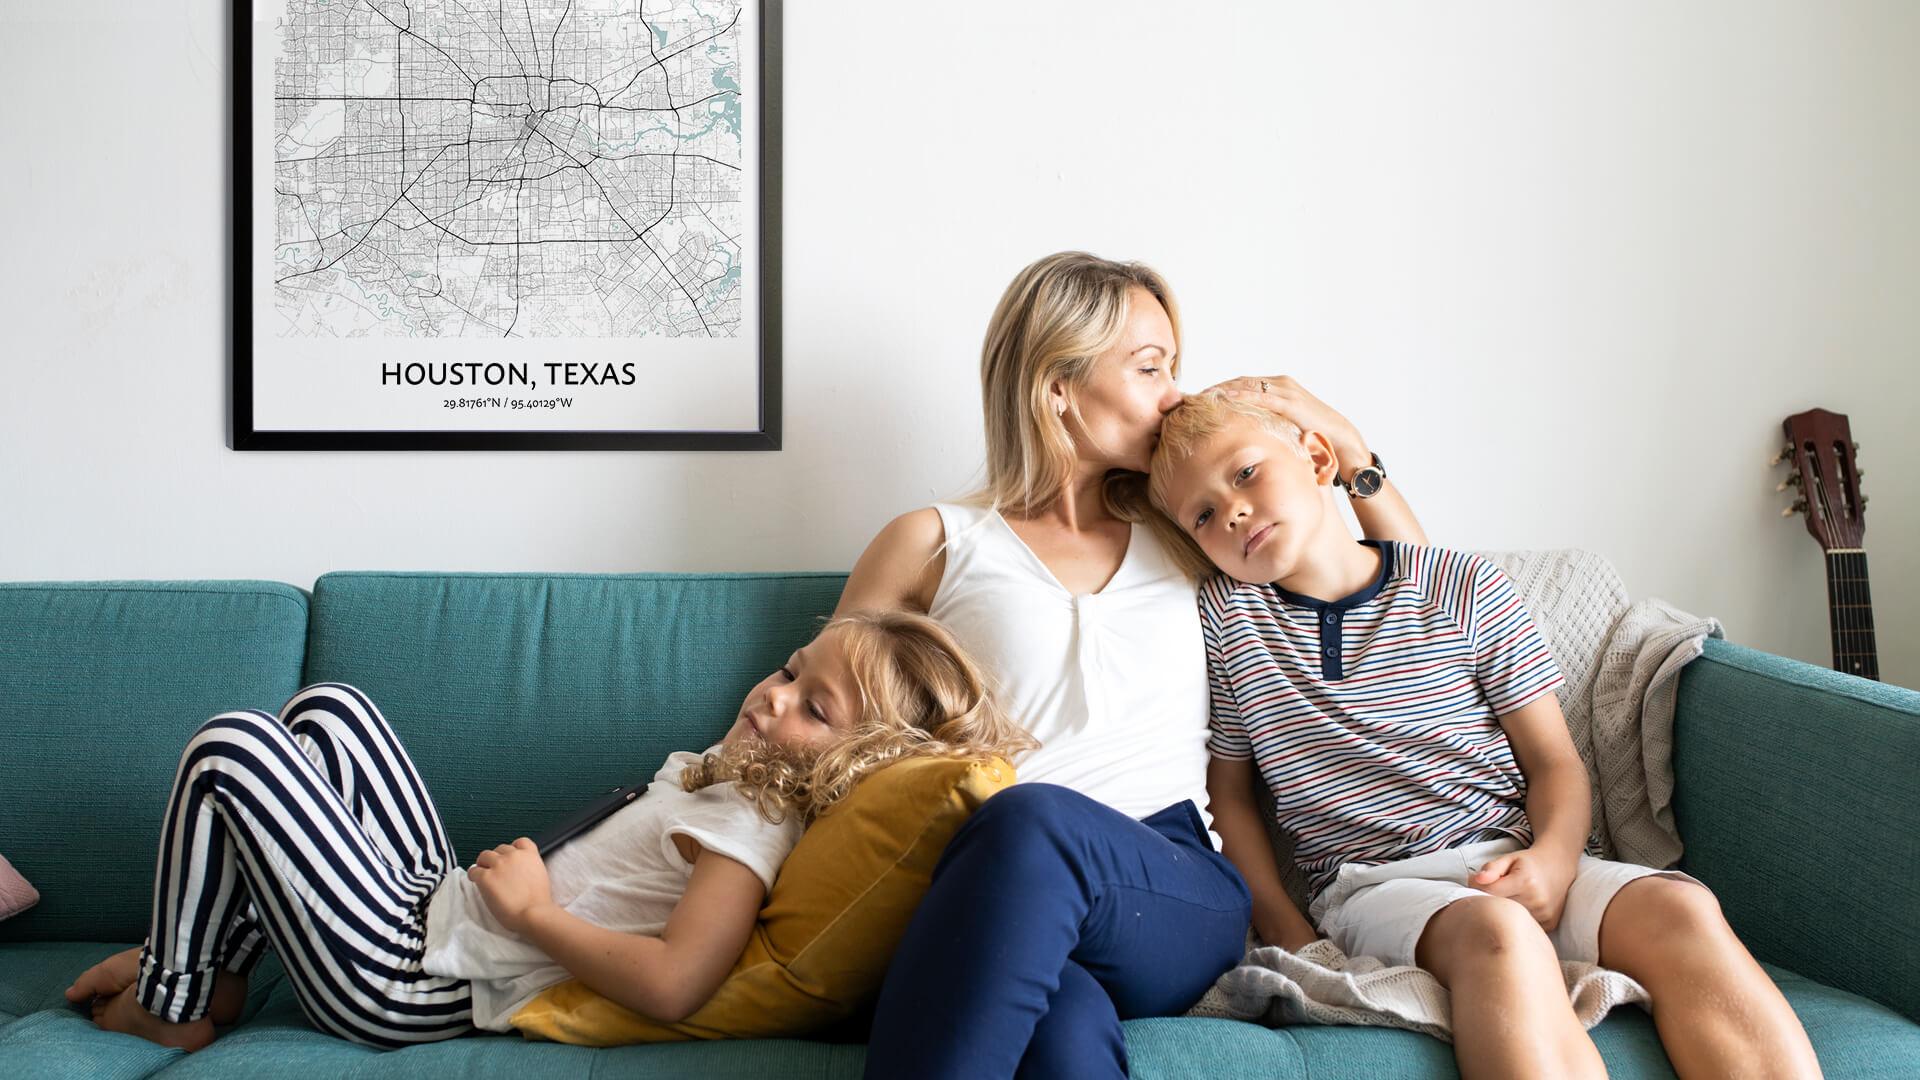 Houston map poster